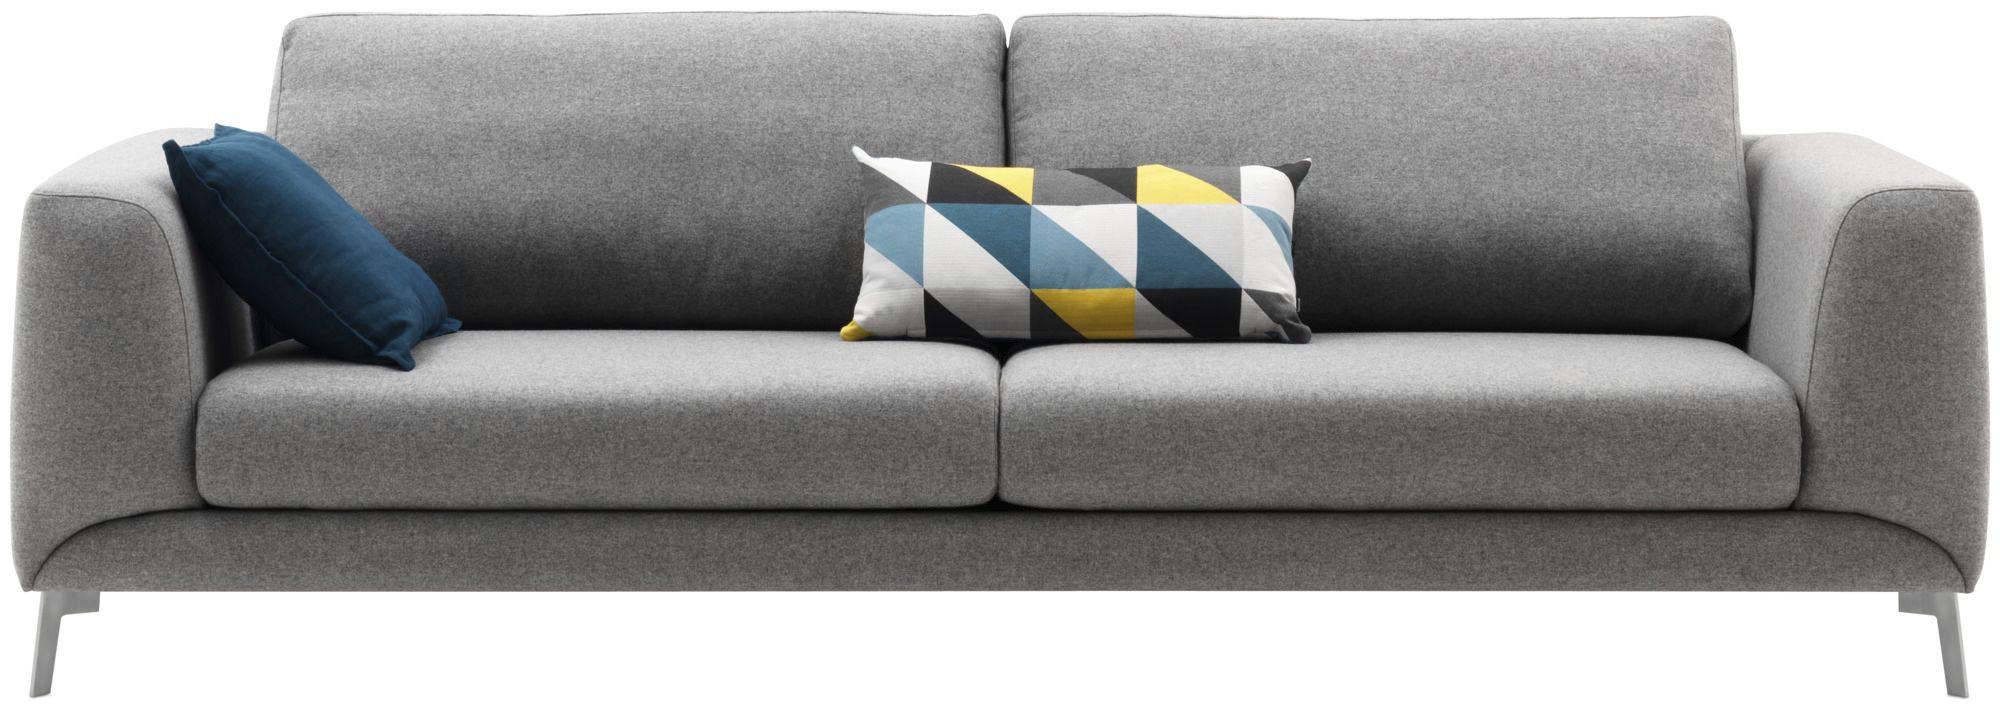 ... Nørgaard BoConcept Corner Sofa / Modular / Contemporary / Leather    FARGO By Anders Nørgaard